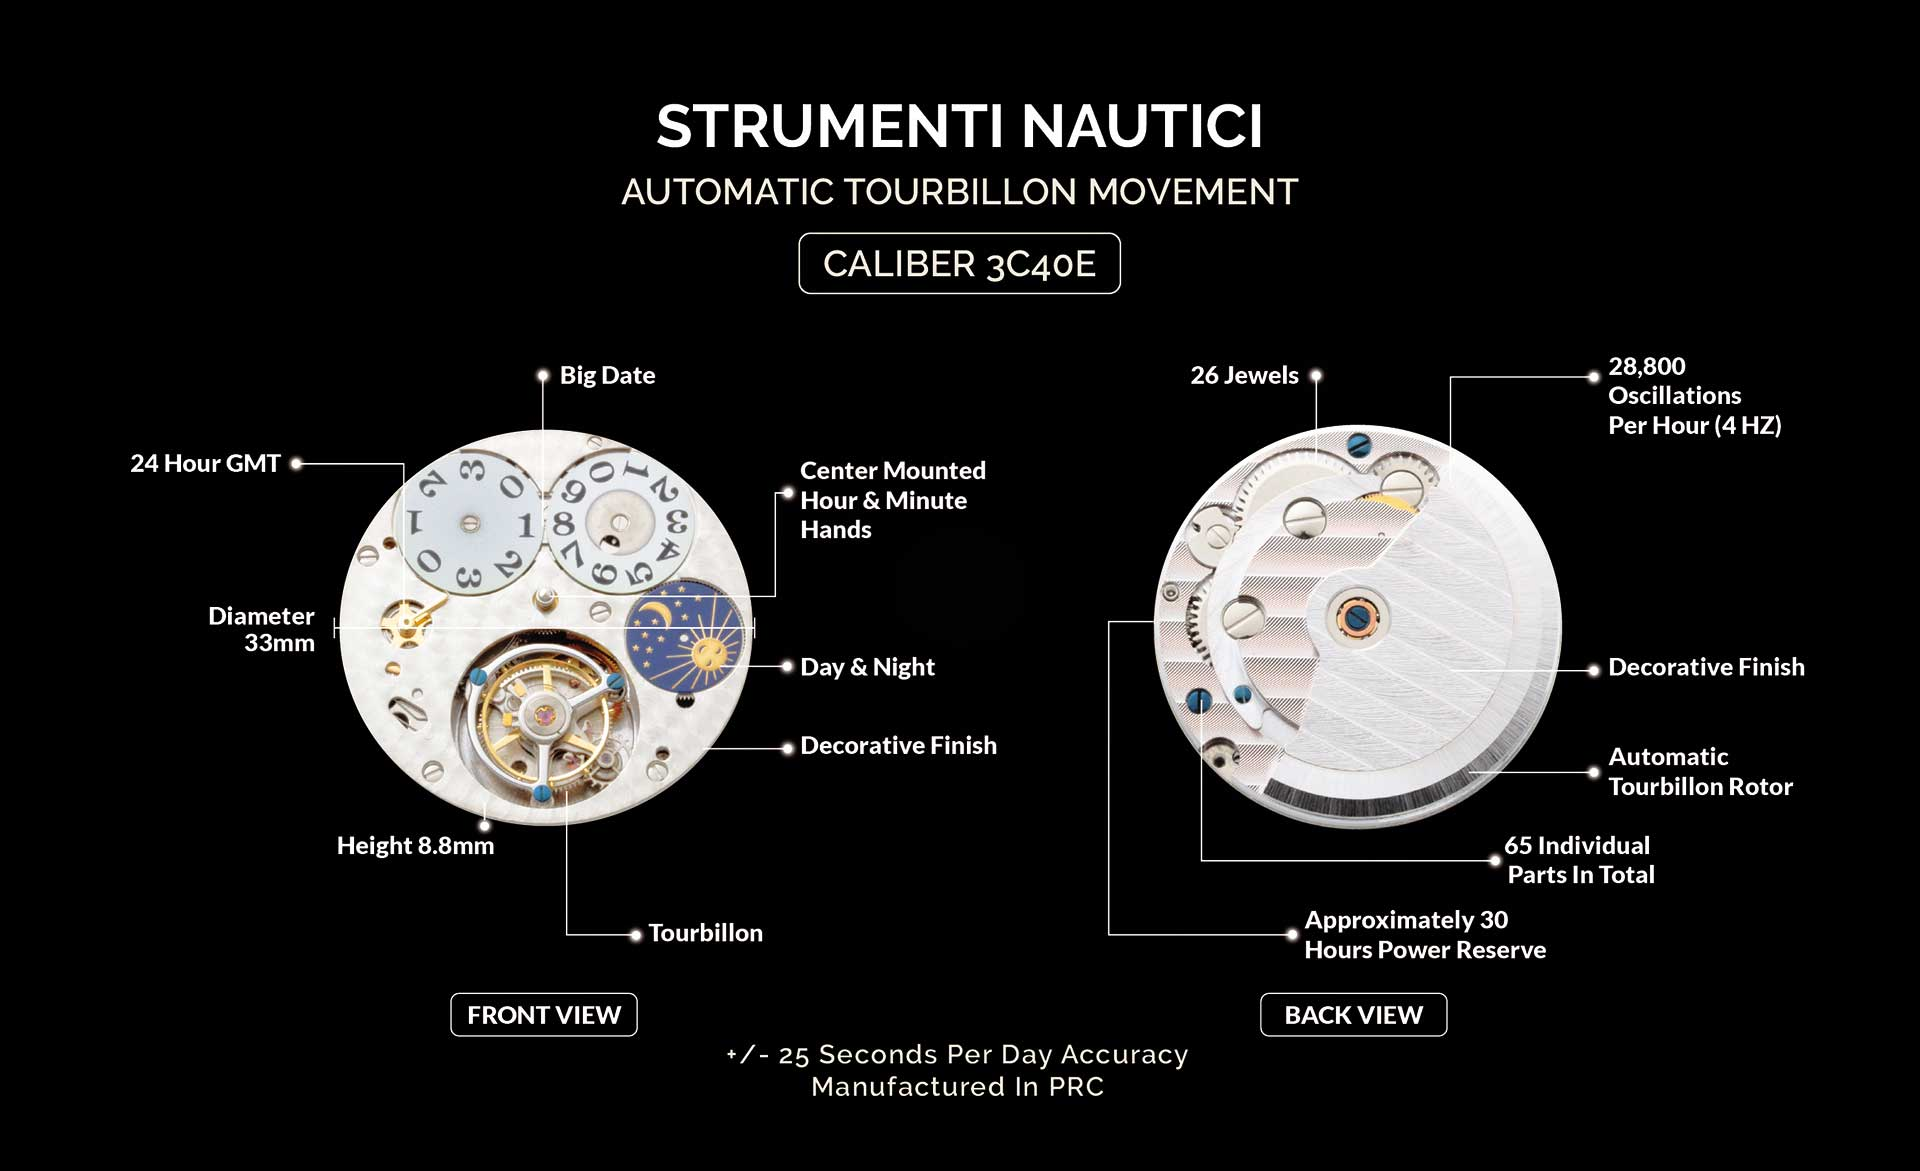 8 Strumenti Nautici Automatic Tourbillon Watch